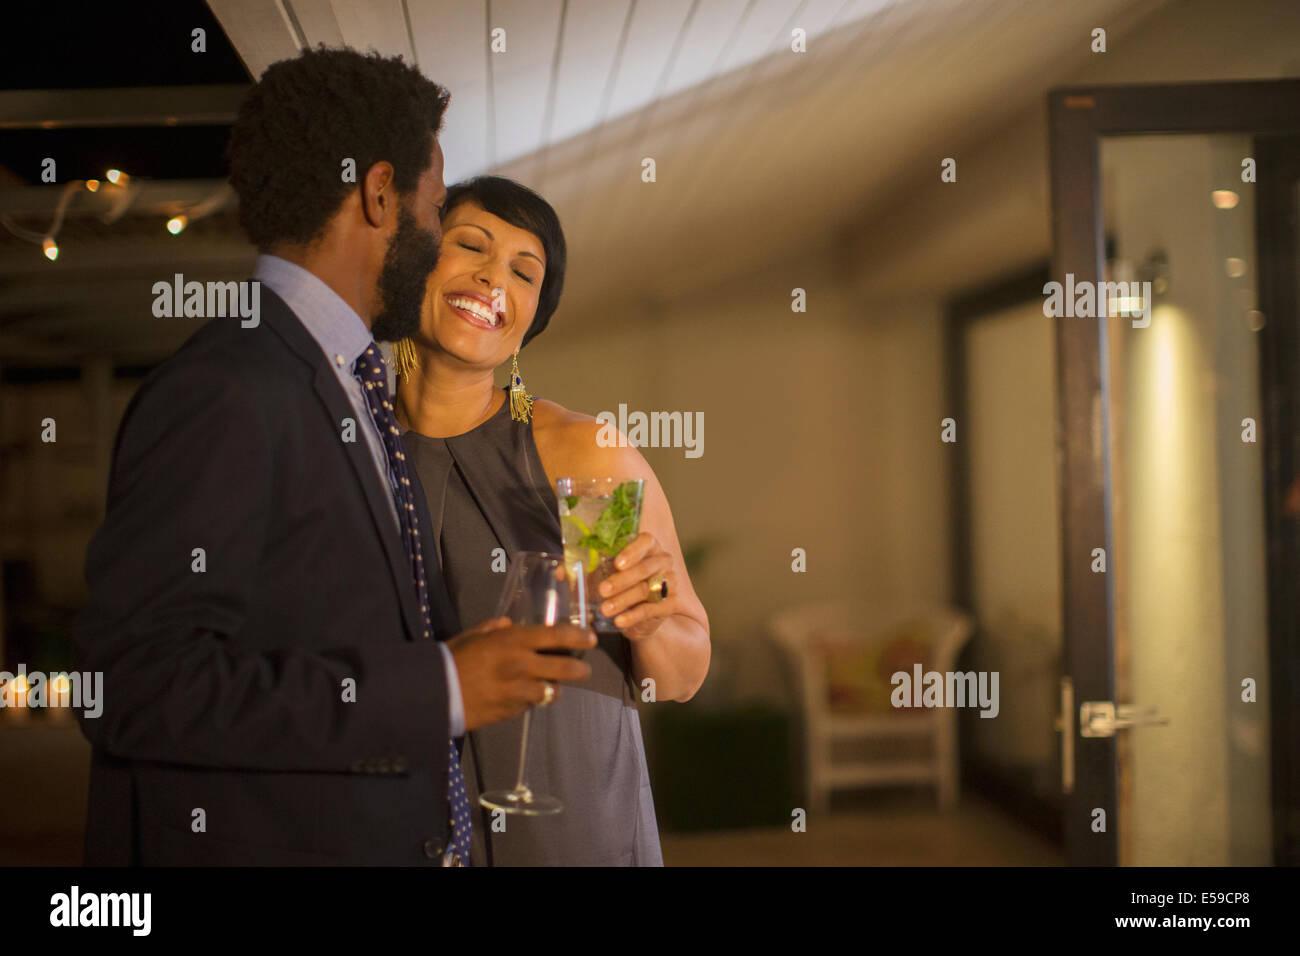 Pareja besándose en parte Imagen De Stock